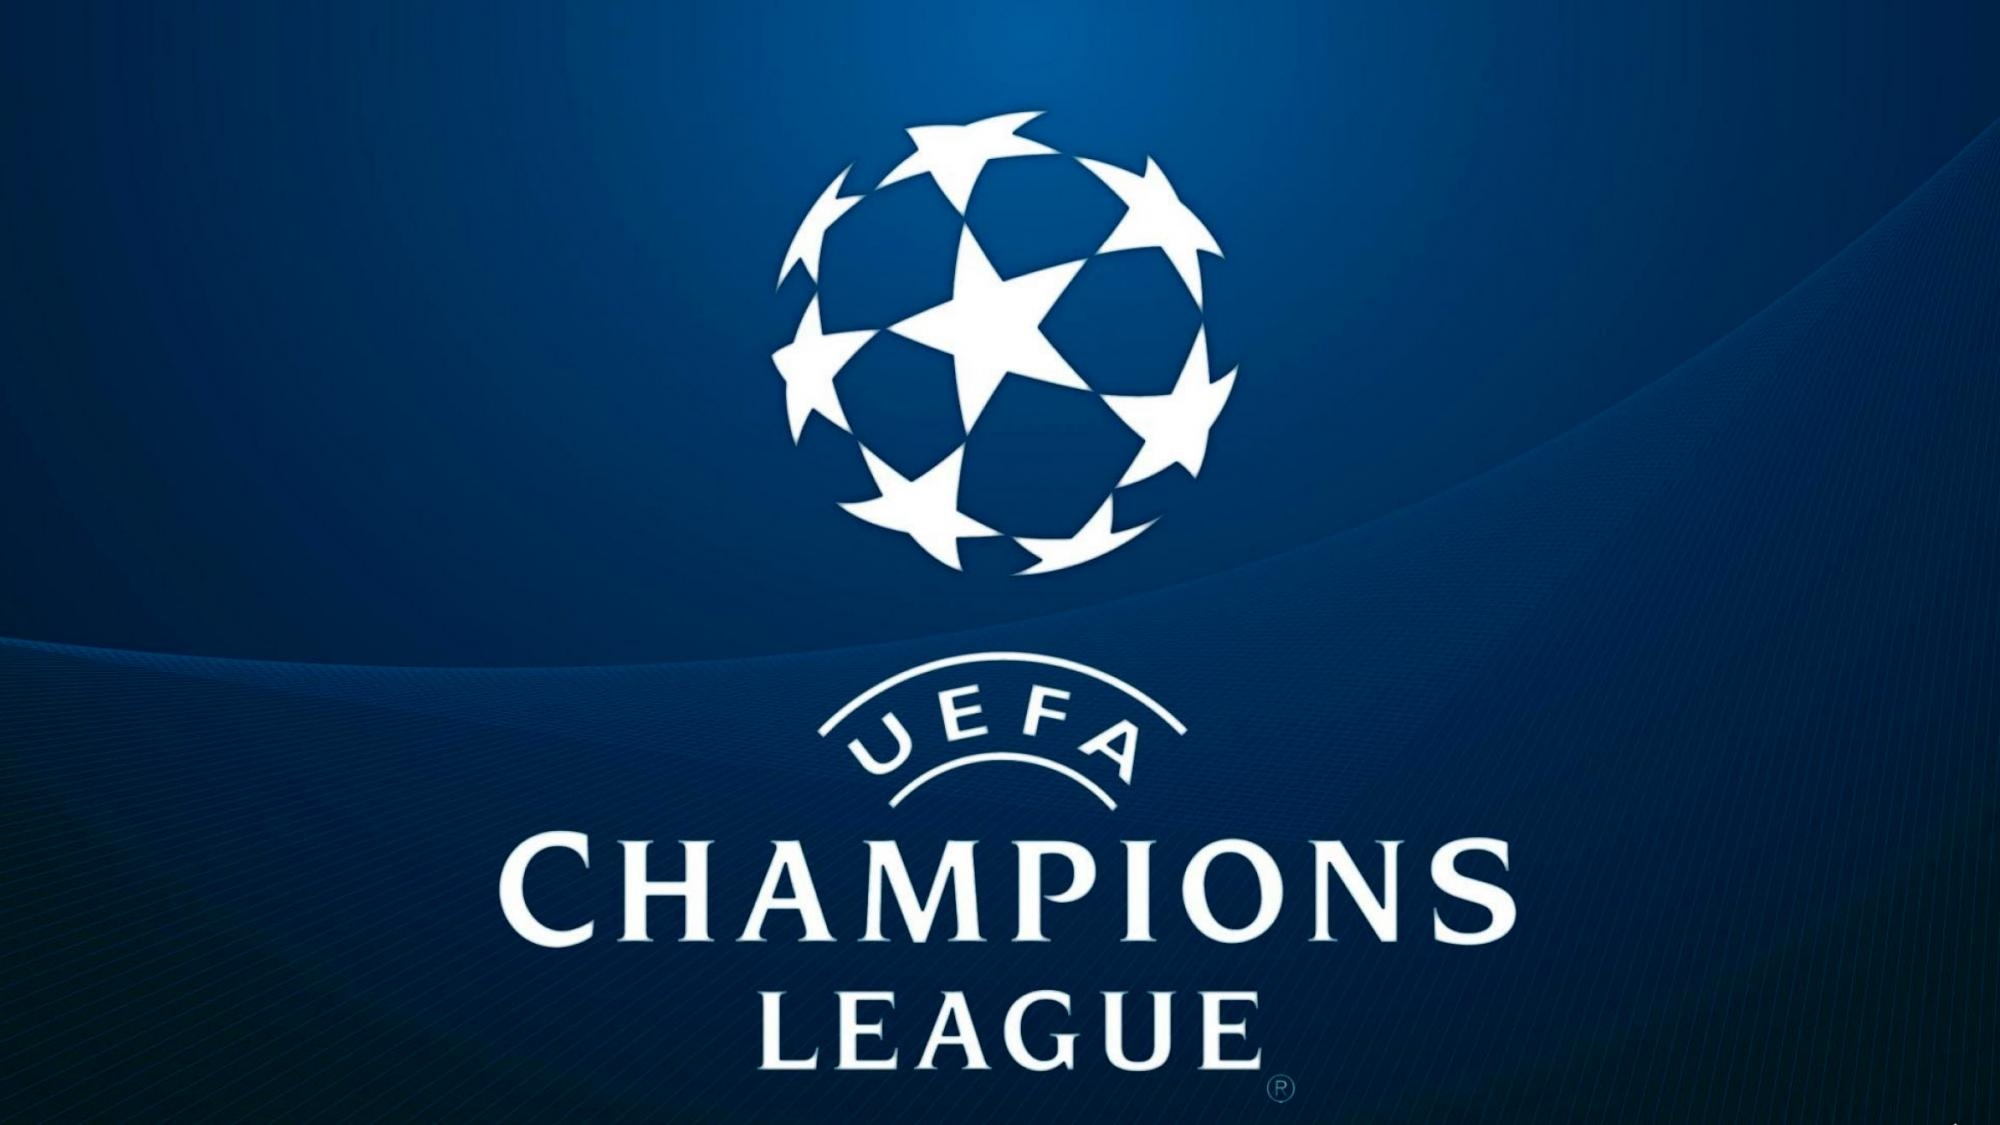 Прогноз на матчи Лиги Чемпионов 22 ноября 2016